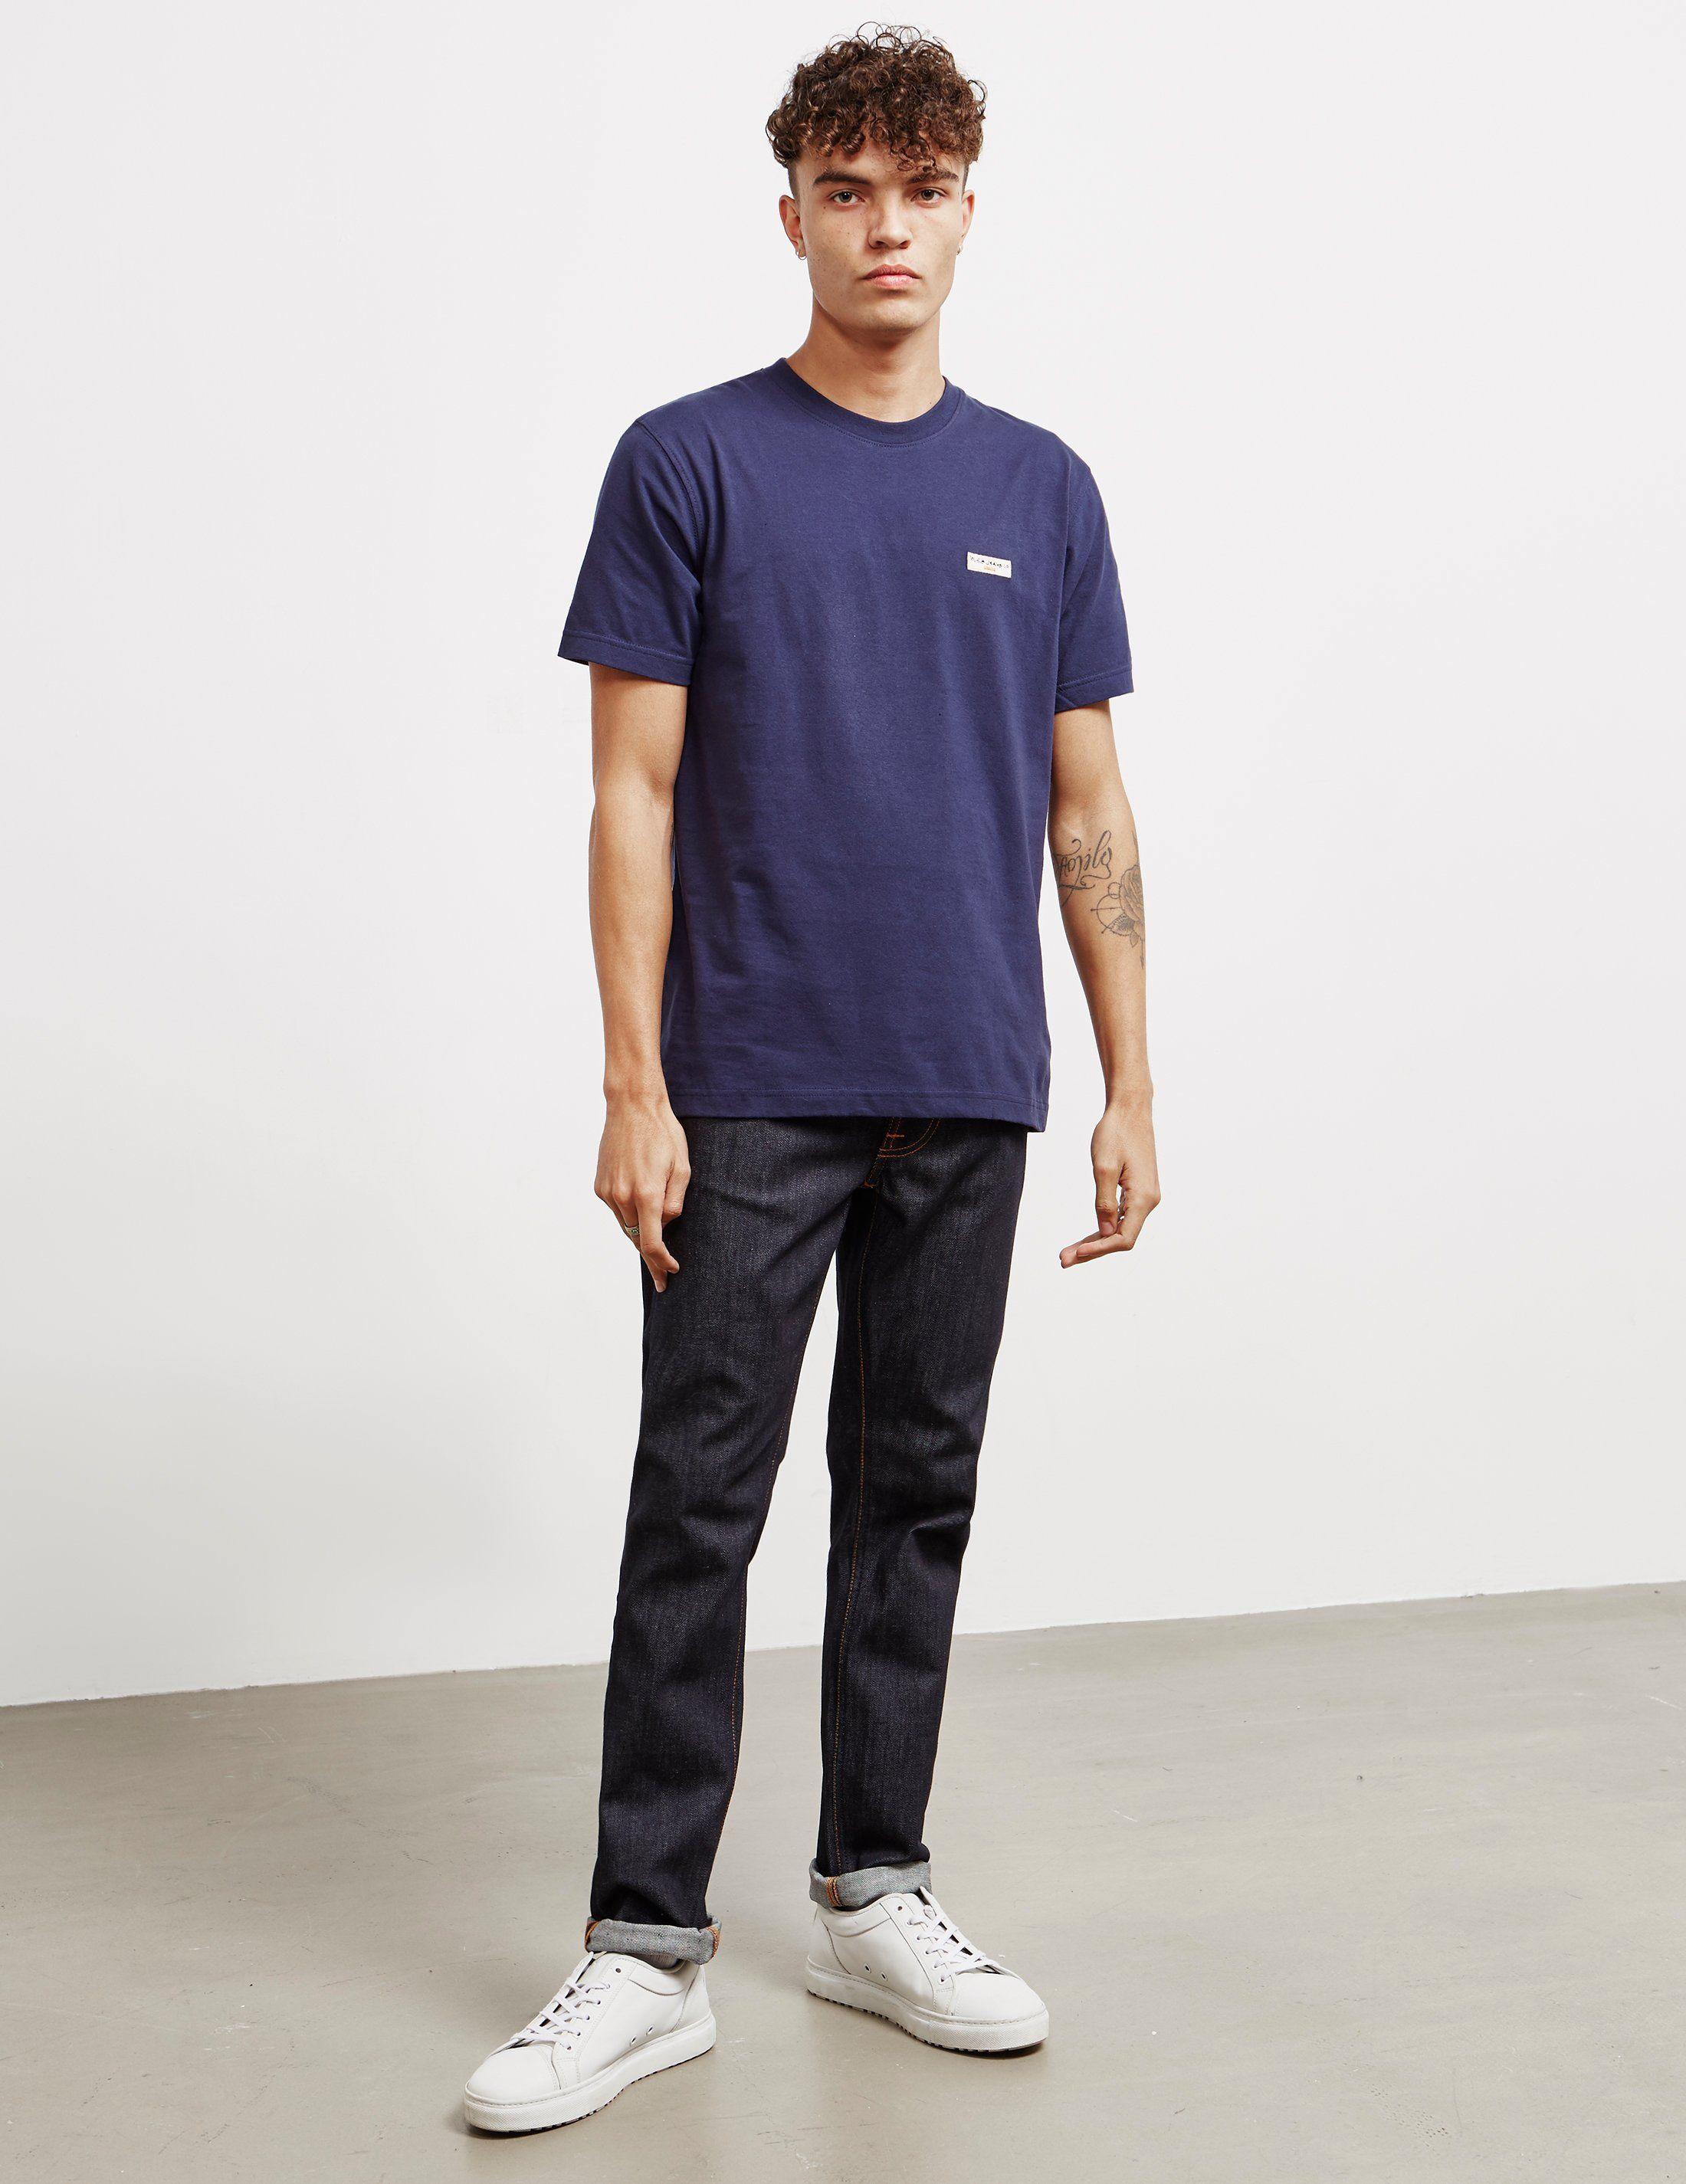 Nudie Jeans Daniel Logo Short Sleeve T-Shirt